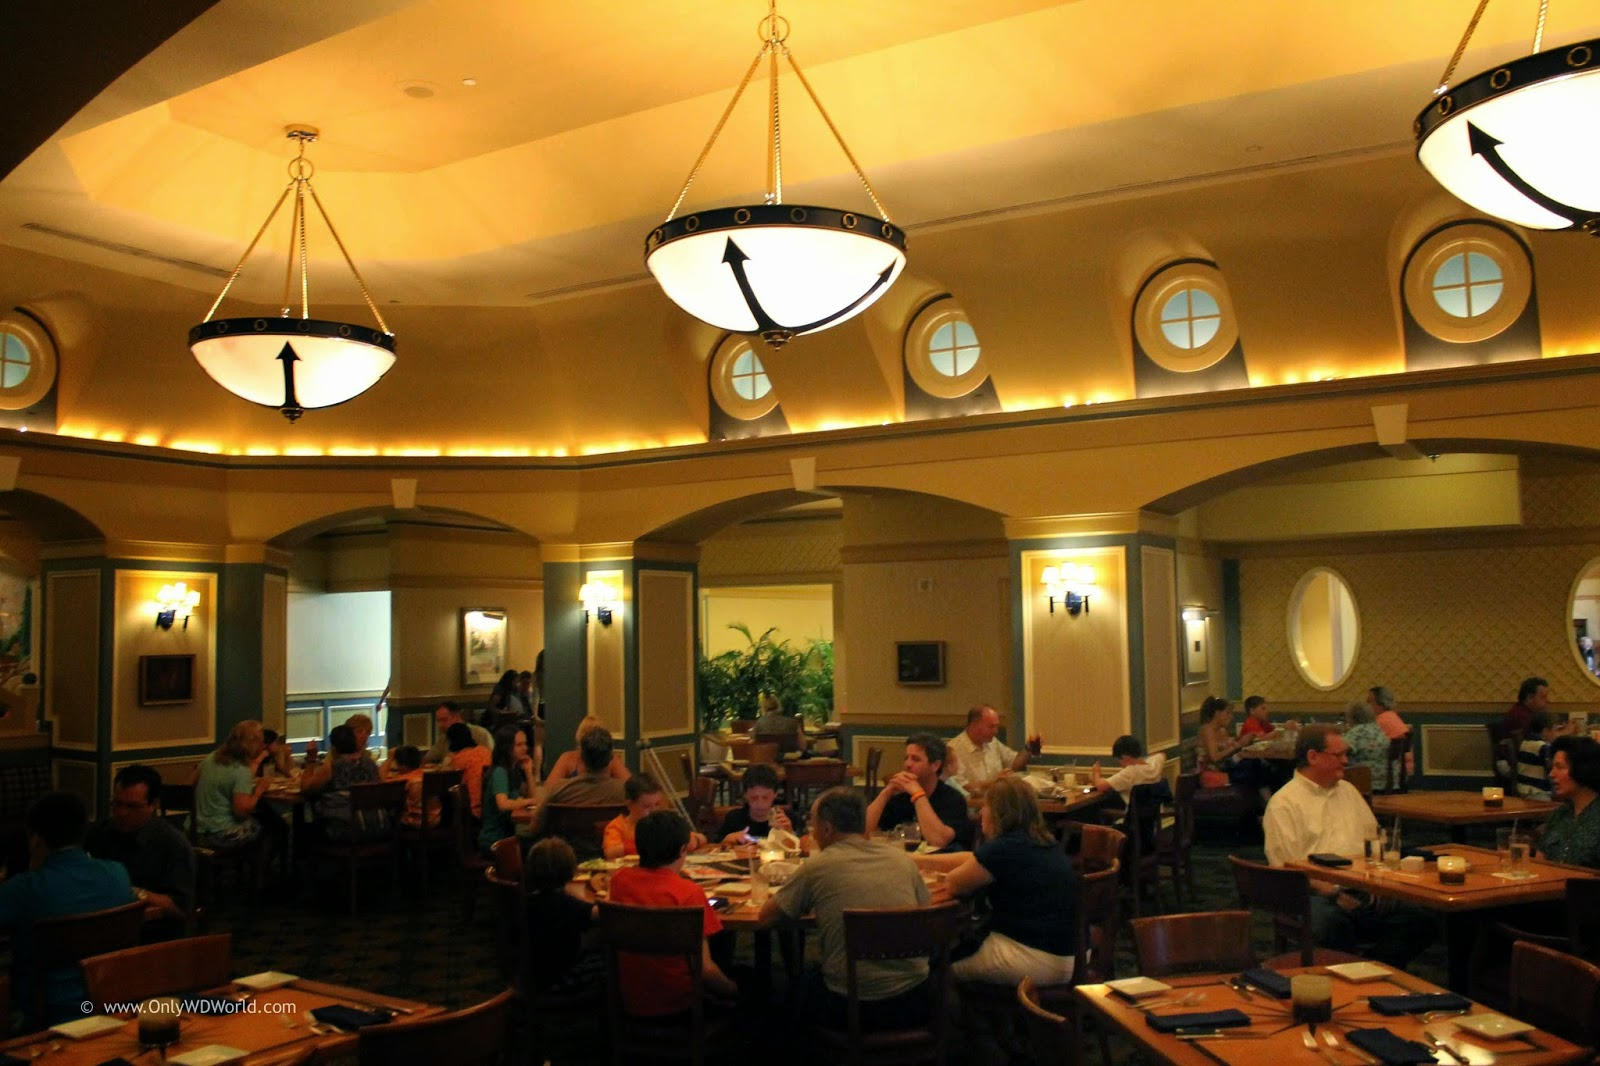 Yacht Club Restaurants Best Restaurants Near Me